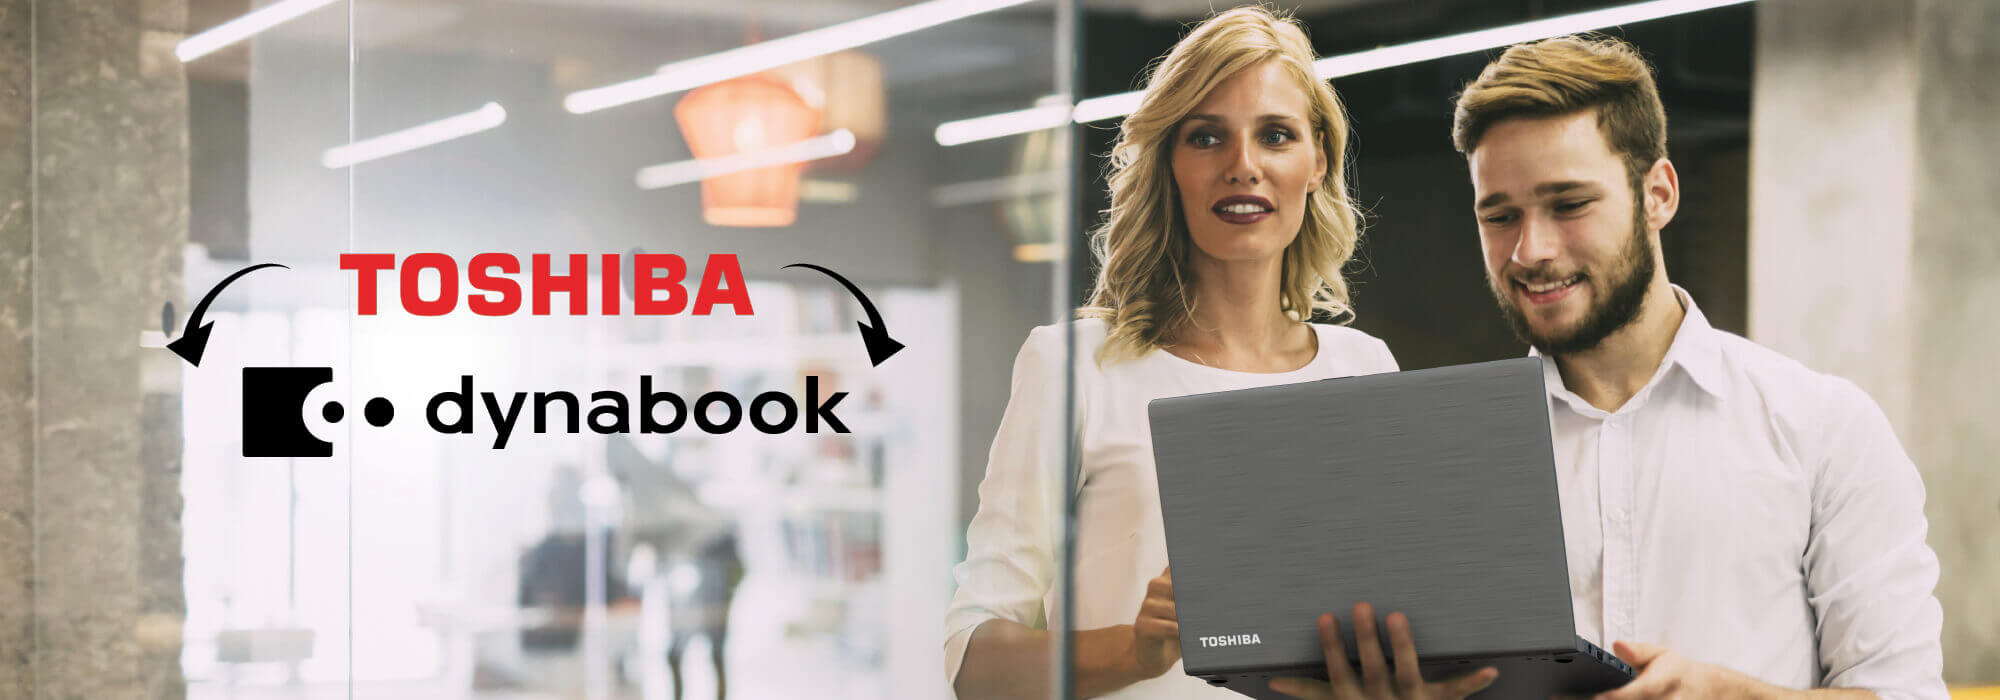 Portátiles Dynabook Toshiba